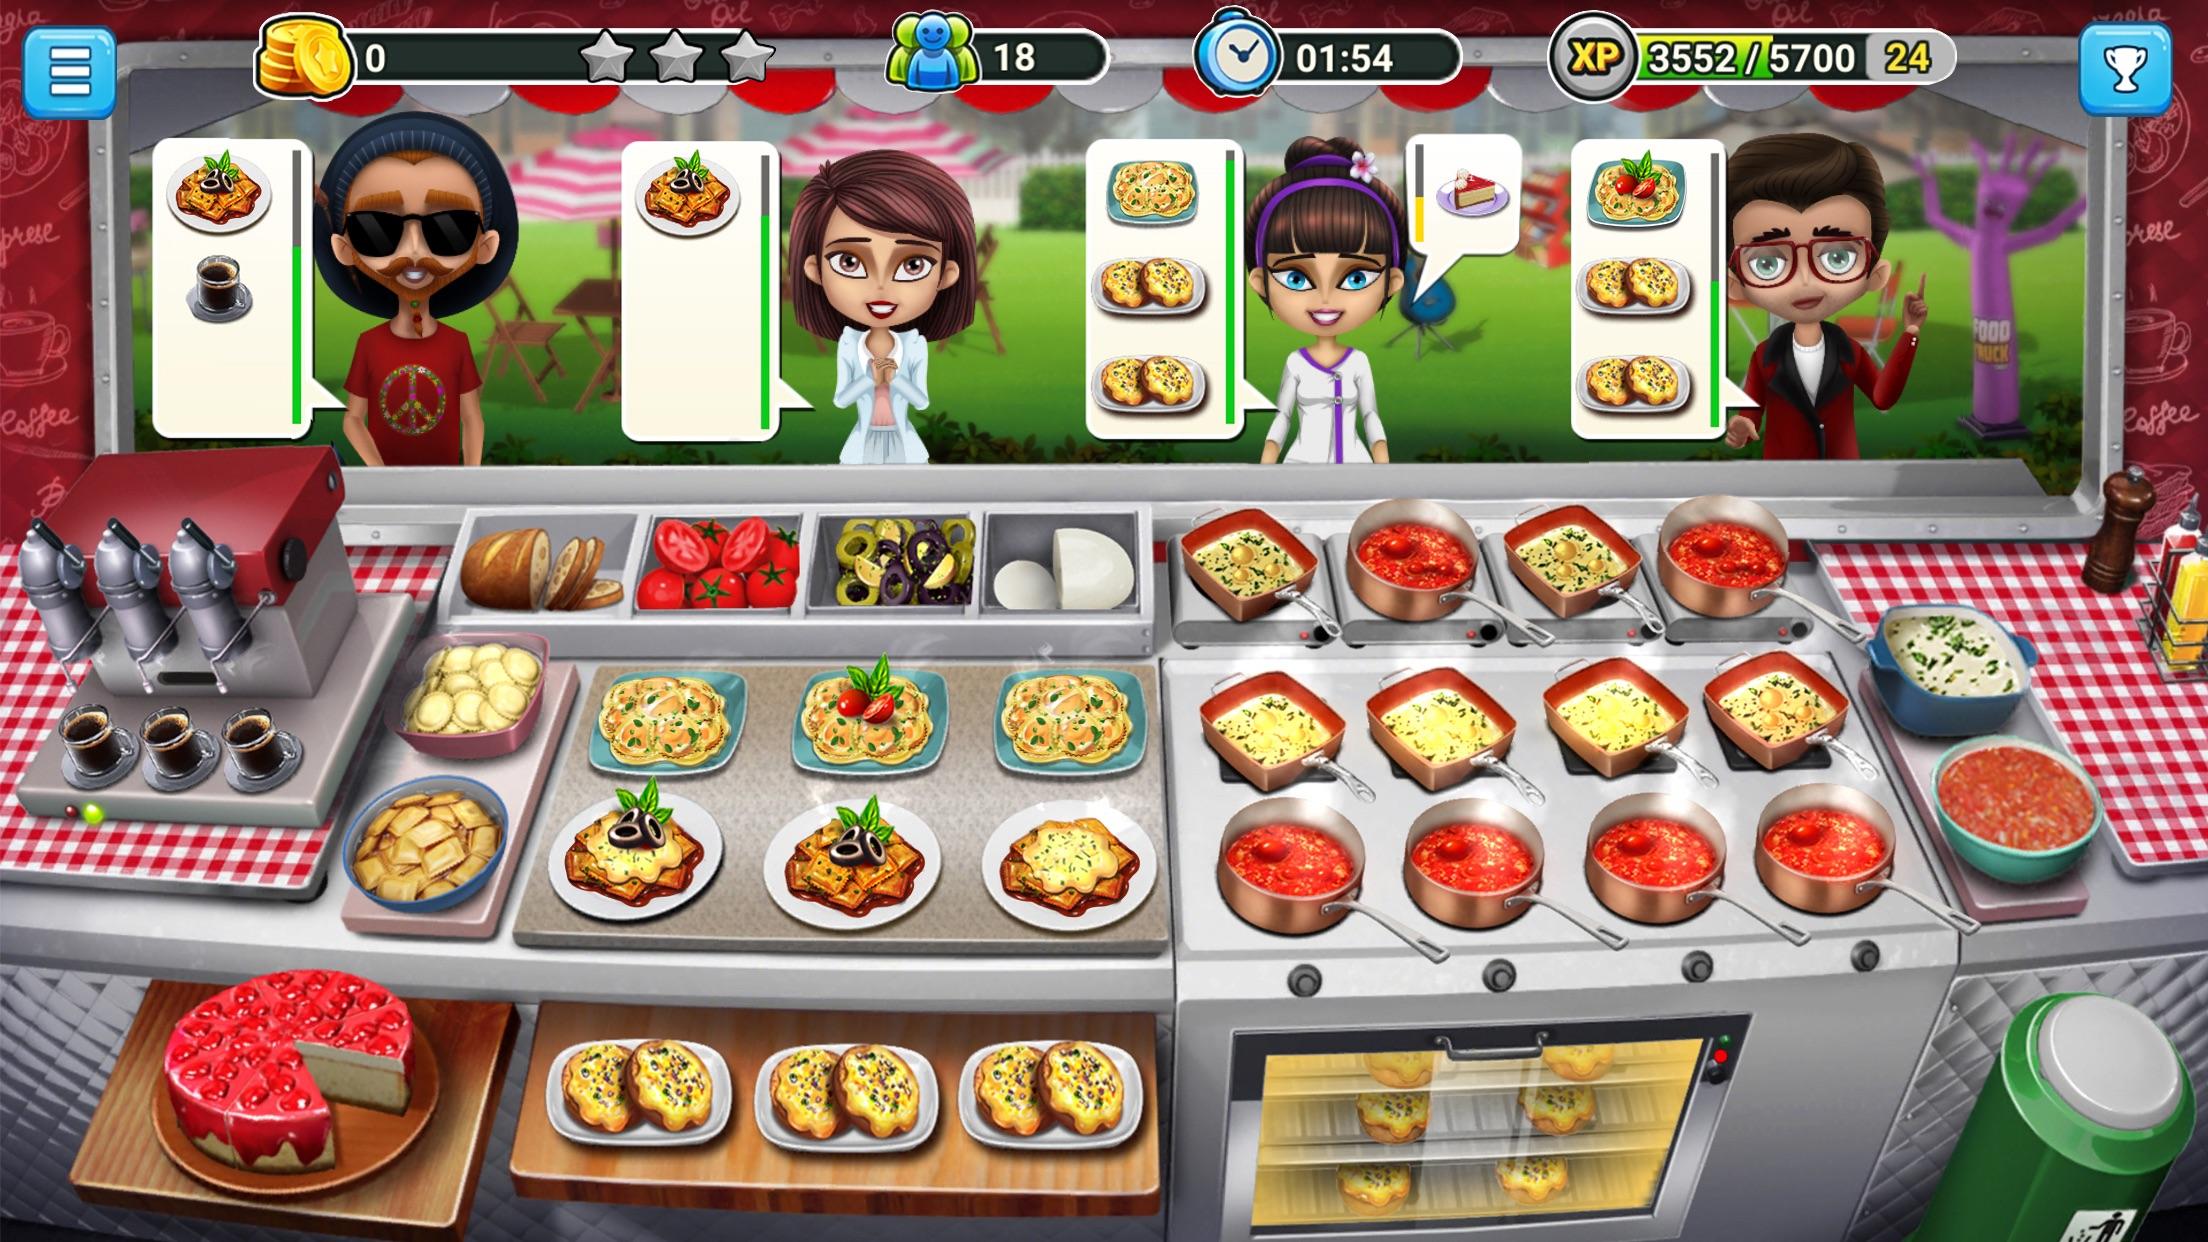 Food Truck Chef: Pizza & Food Screenshot